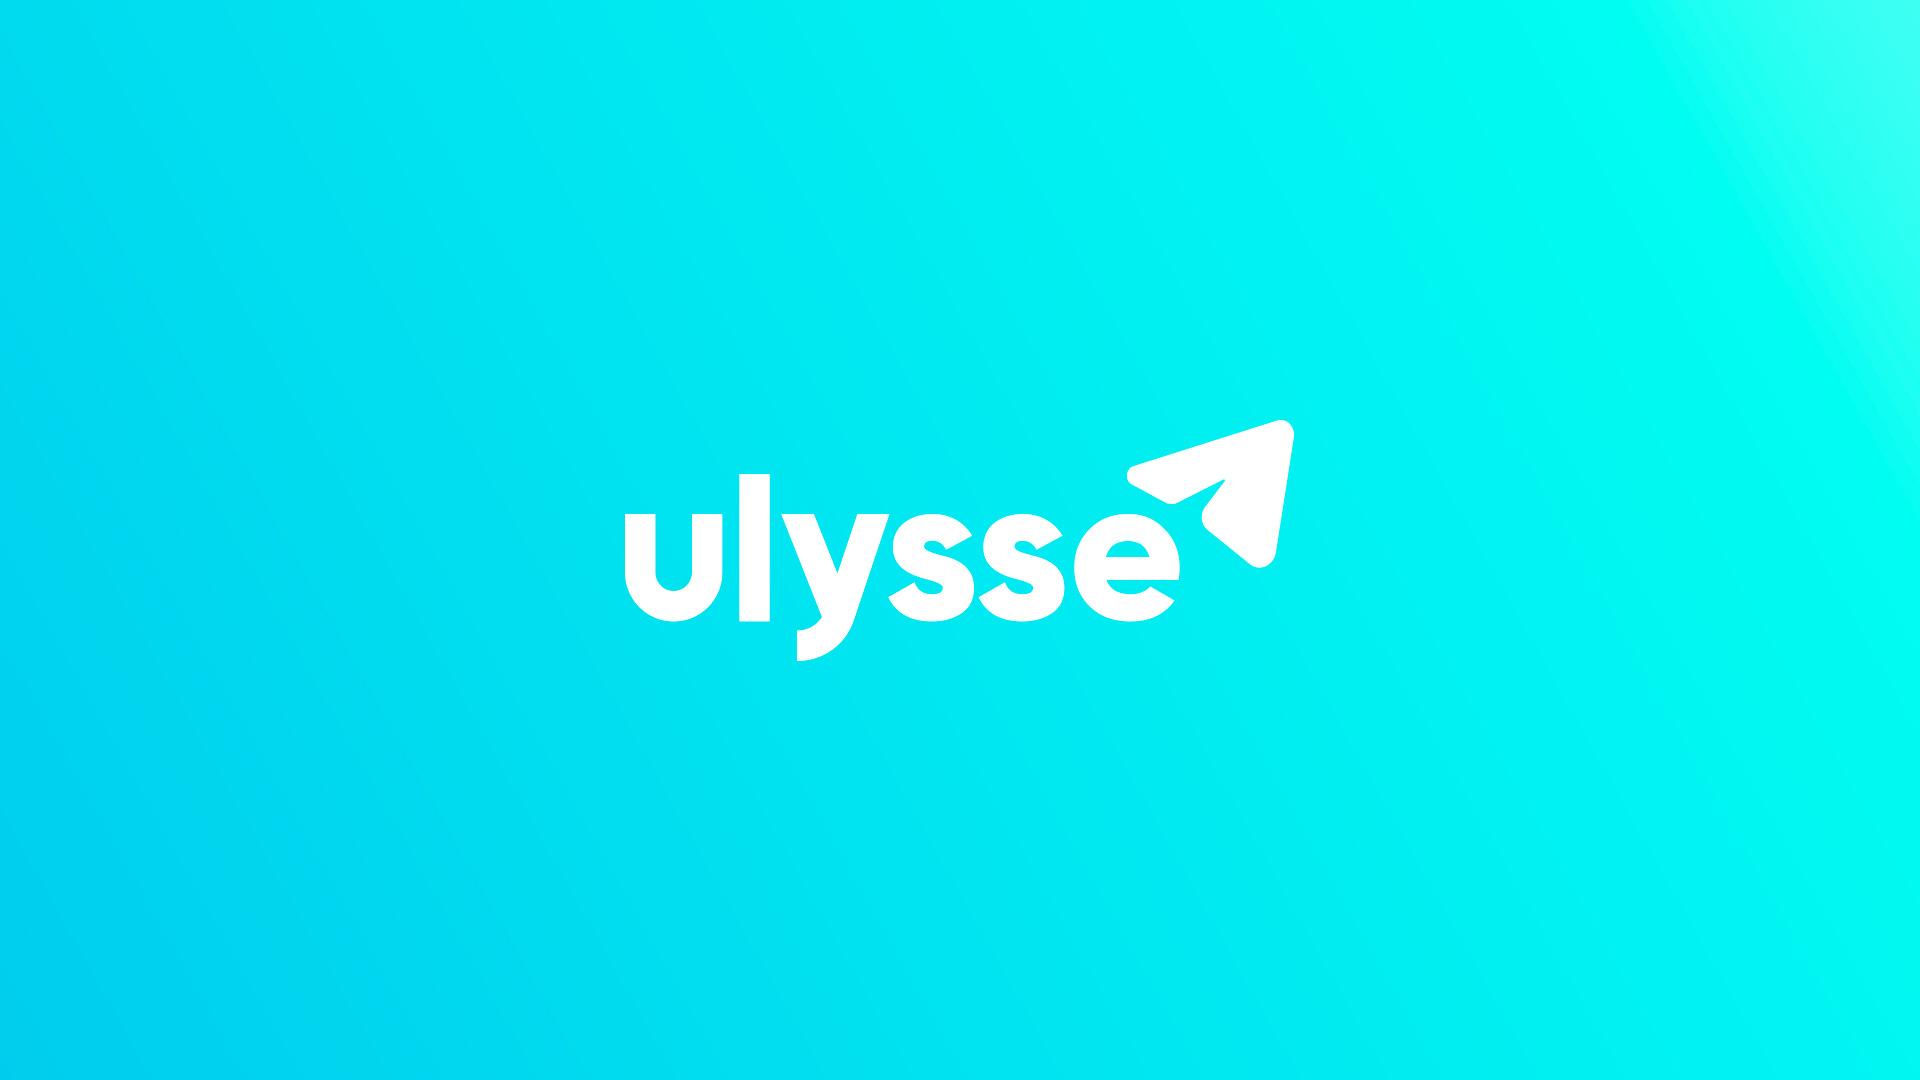 ulysse-02